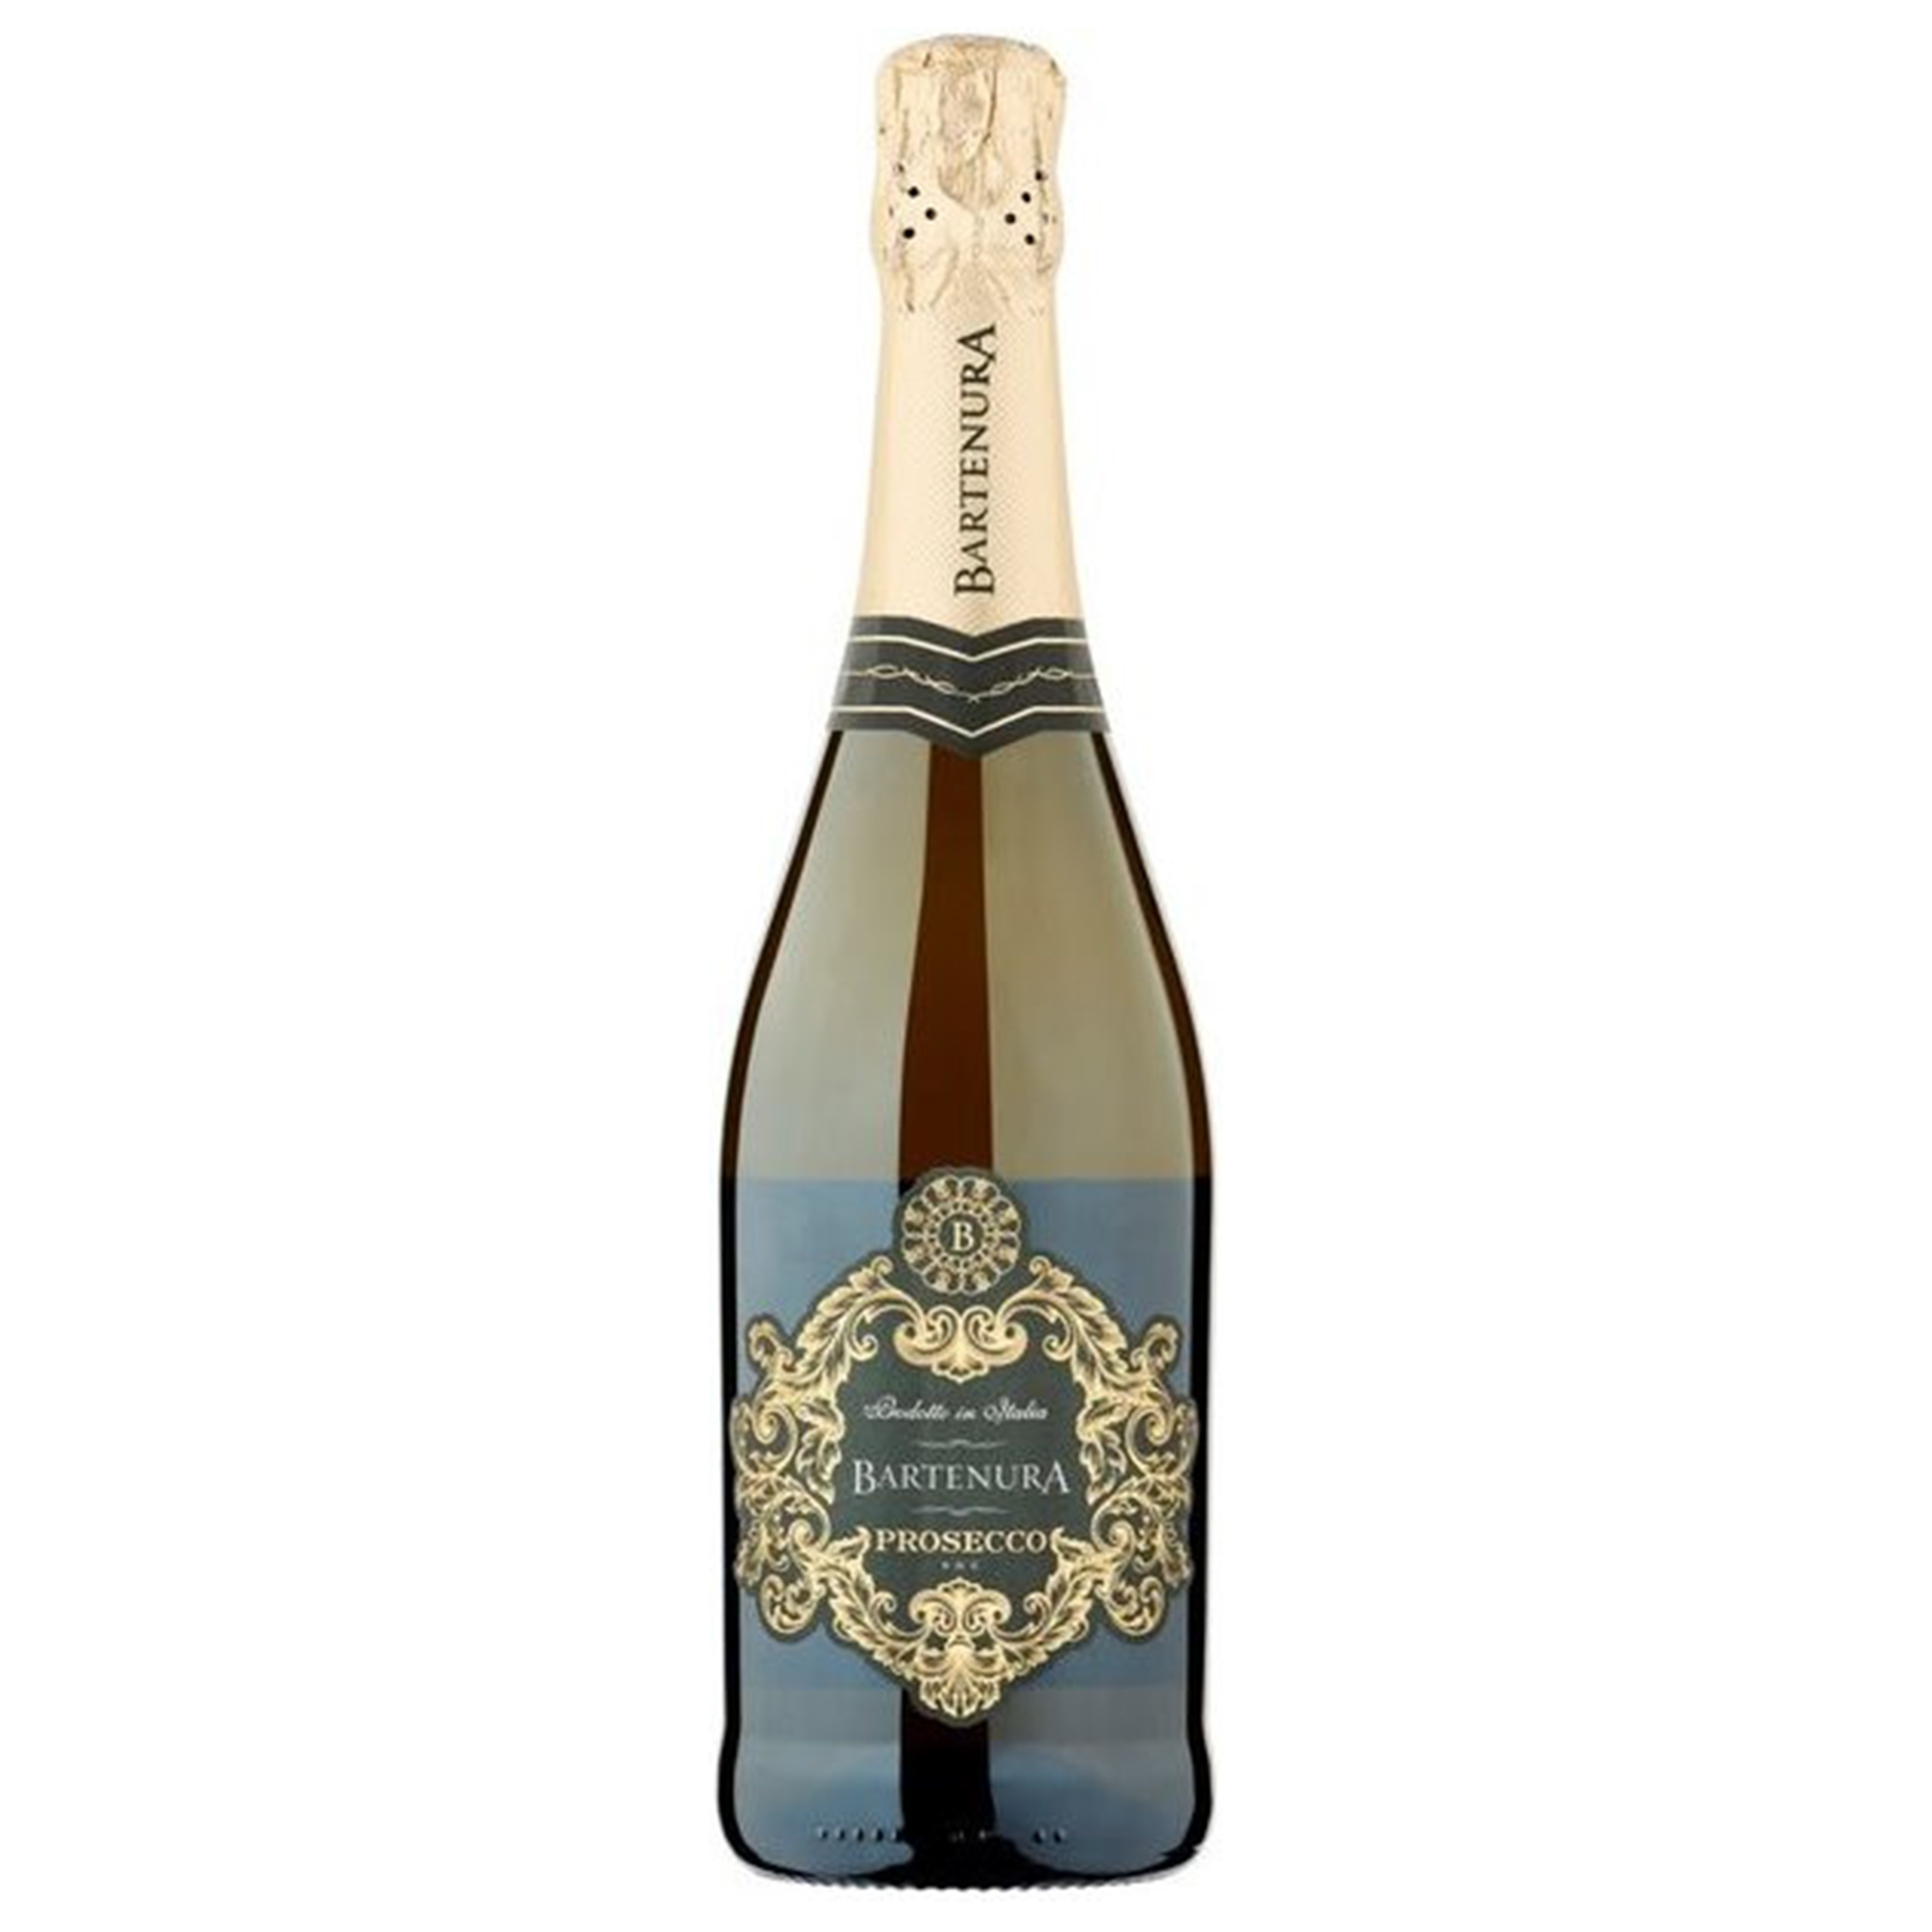 Игристое вино Bartenura Prosecco DOC Brut 0,75 л